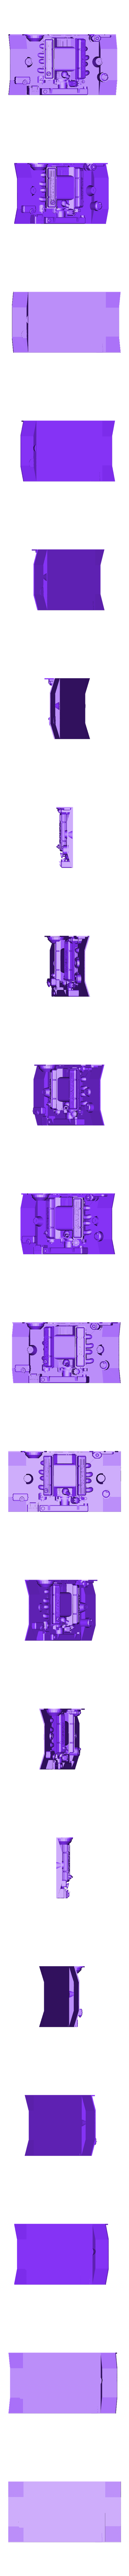 ENGINE BAY RANGE ROVER avec logo ROVER.stl Download STL file Engine Bay RANGE ROVER classic 1/10 • 3D printer object, RCGANG93